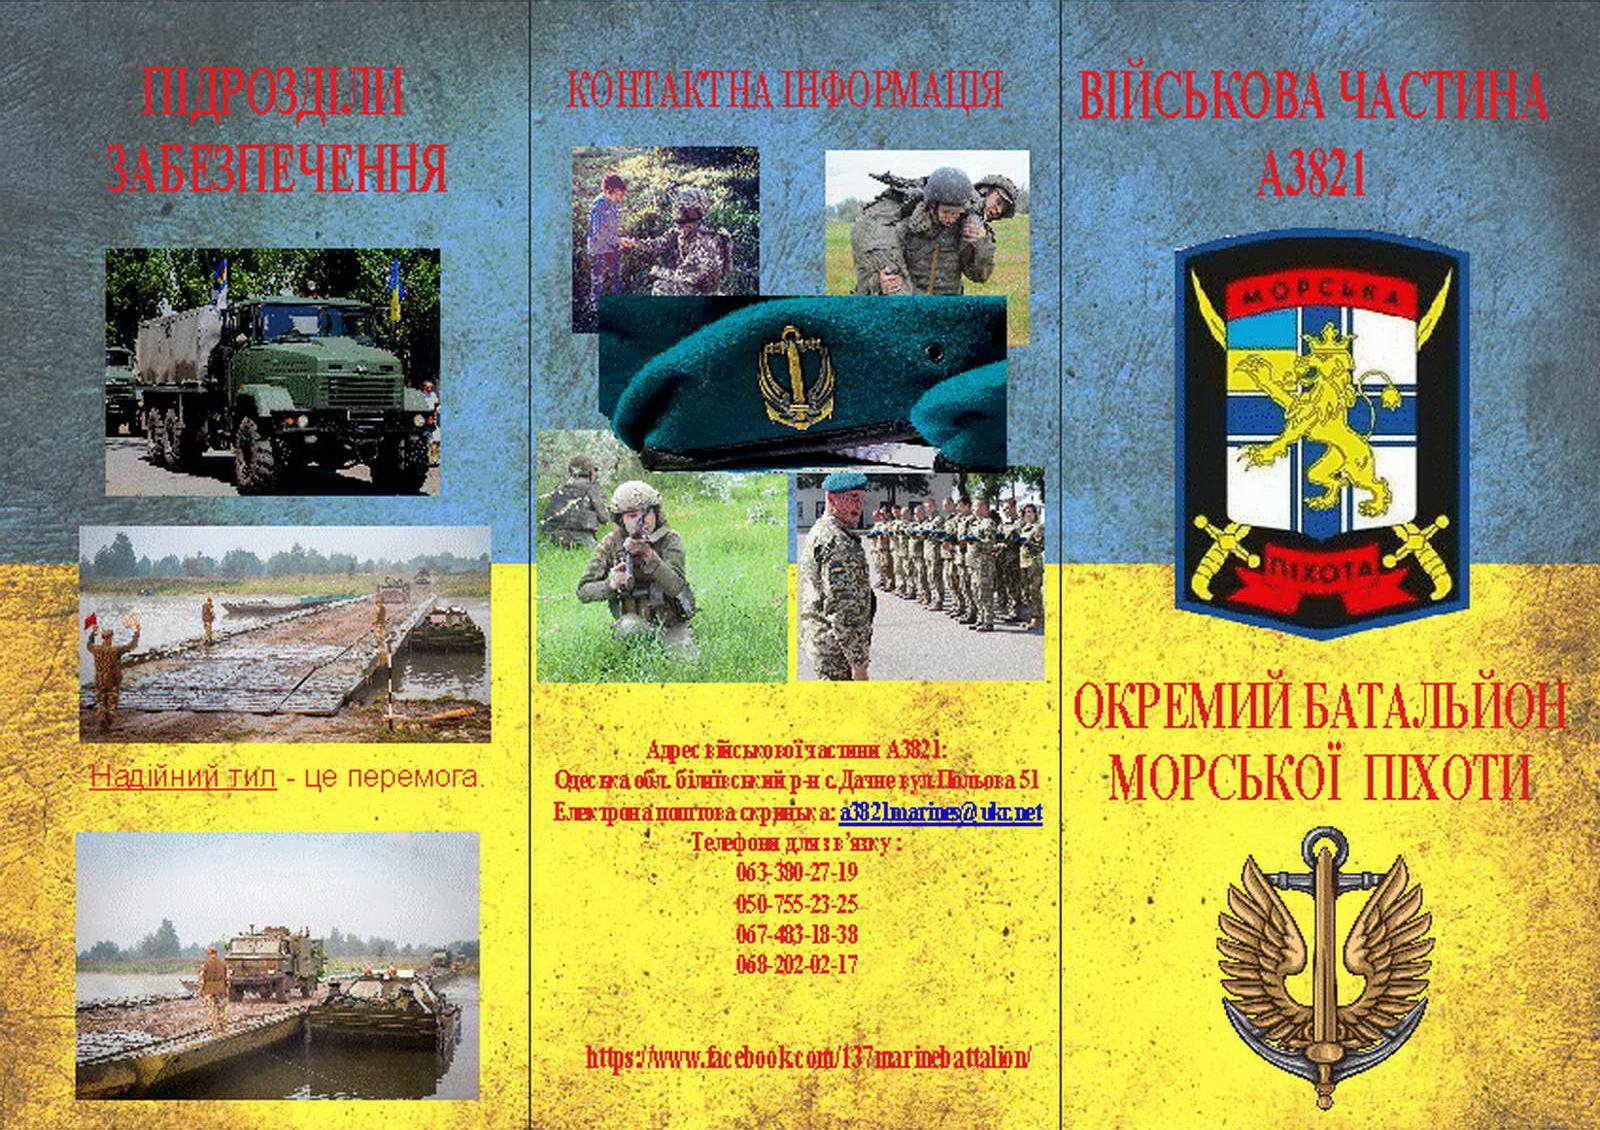 Окремий батальйон морської піхоти